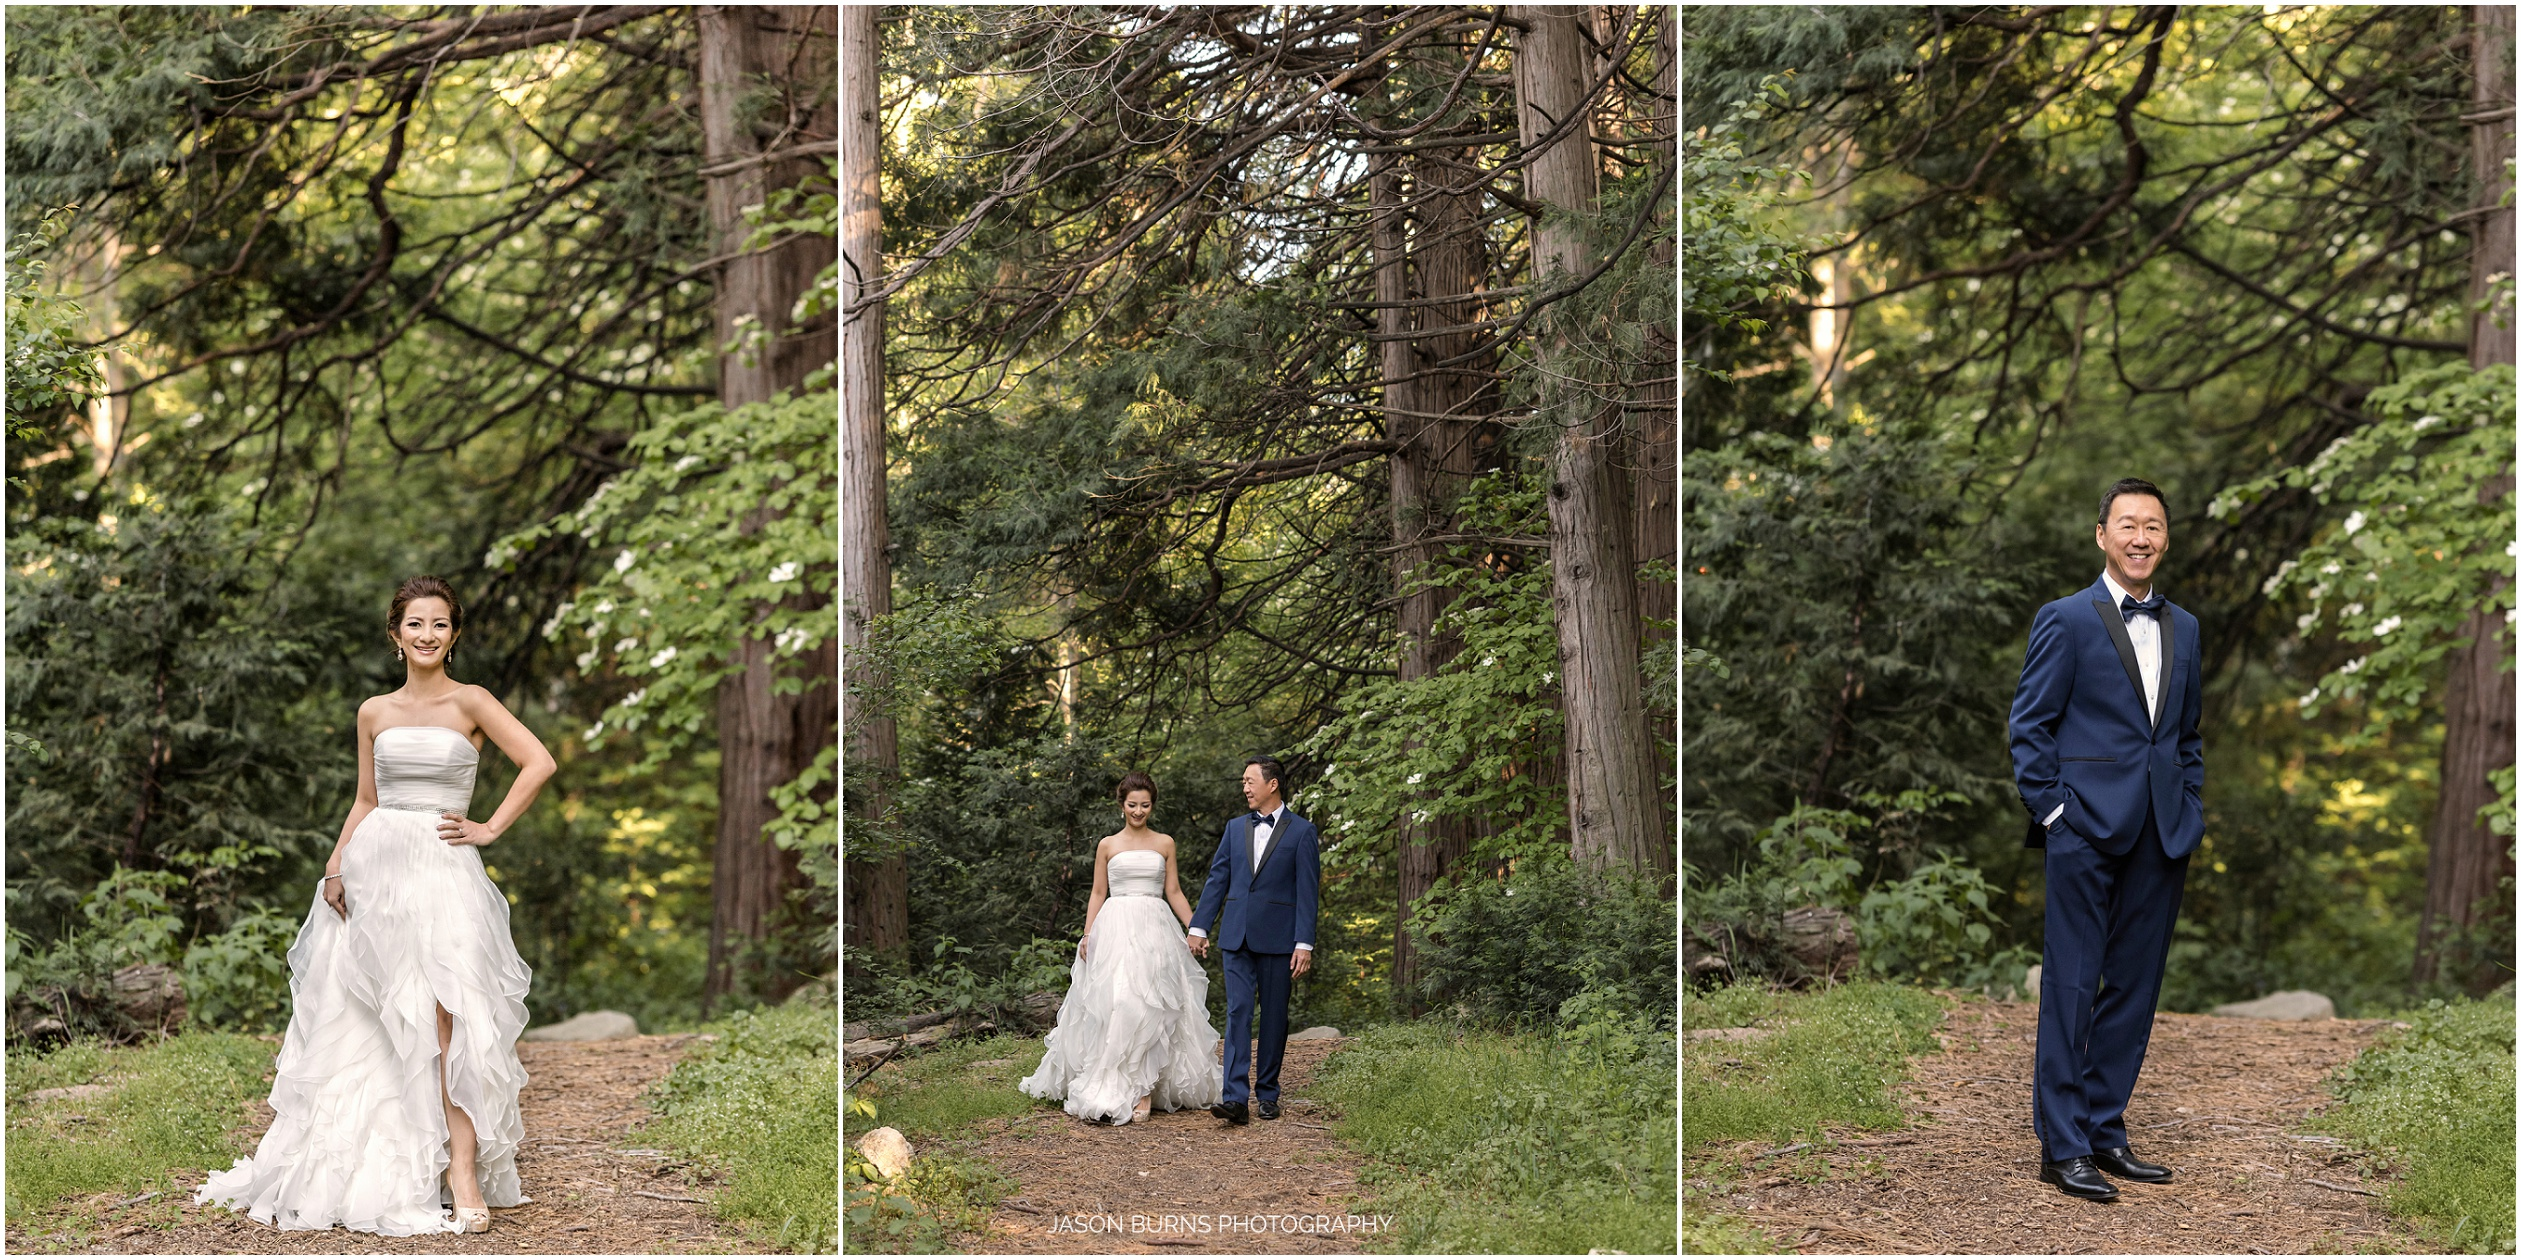 Lake-arrowhead-resort-wedding-pine-rose (2)